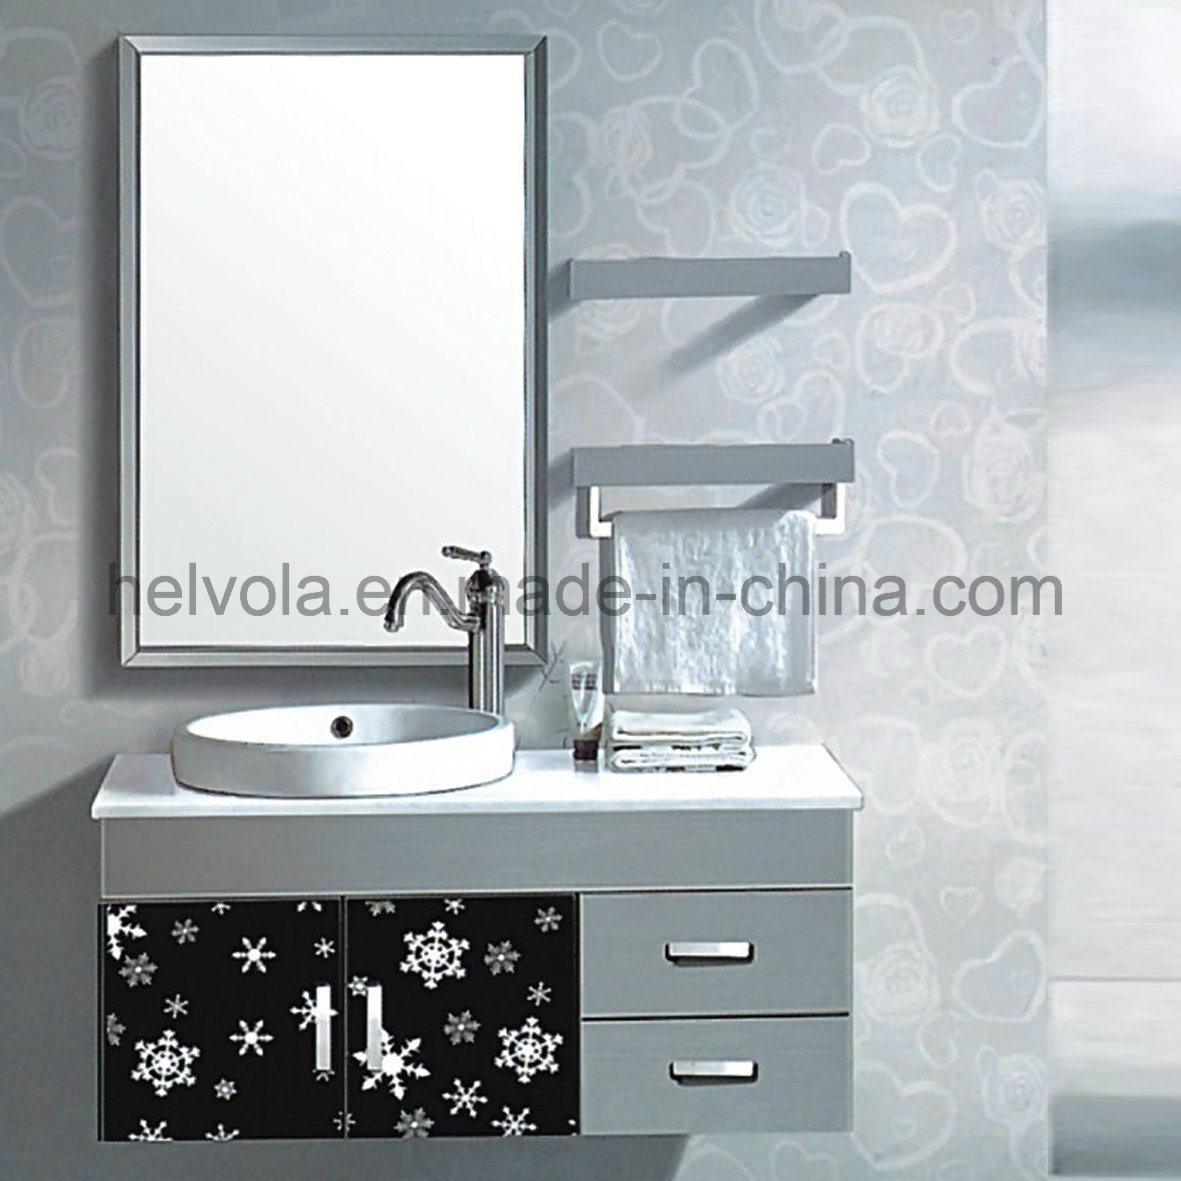 China Sanitary Ware Bathroom Basin Accessories Cabinet Bathroom ...